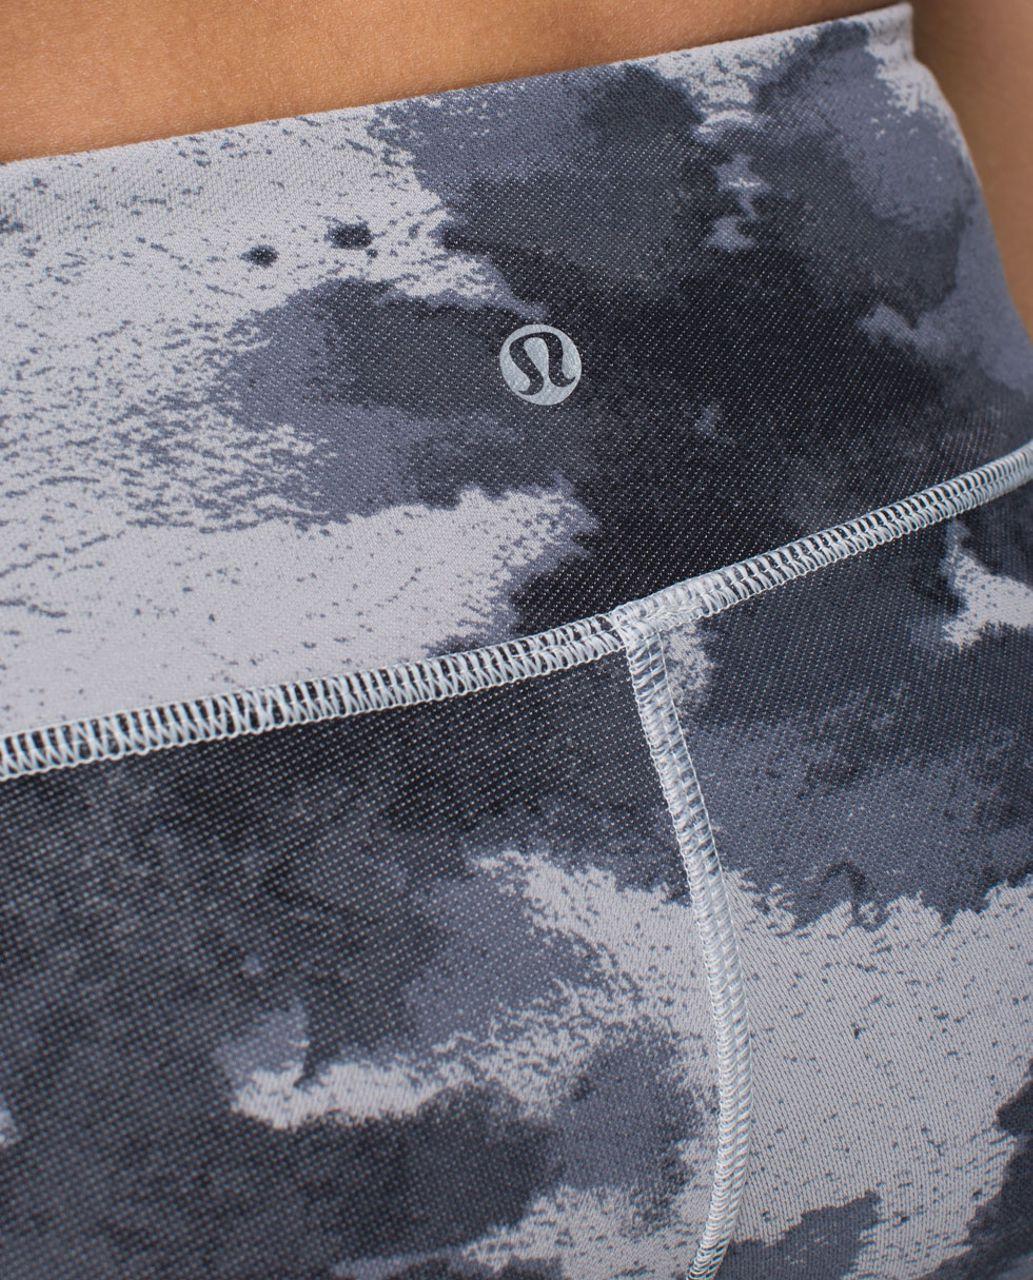 Lululemon Wunder Under Pant (Print) - Floral Platoon Silver Spoon / Ambient Grey / Silver Spoon